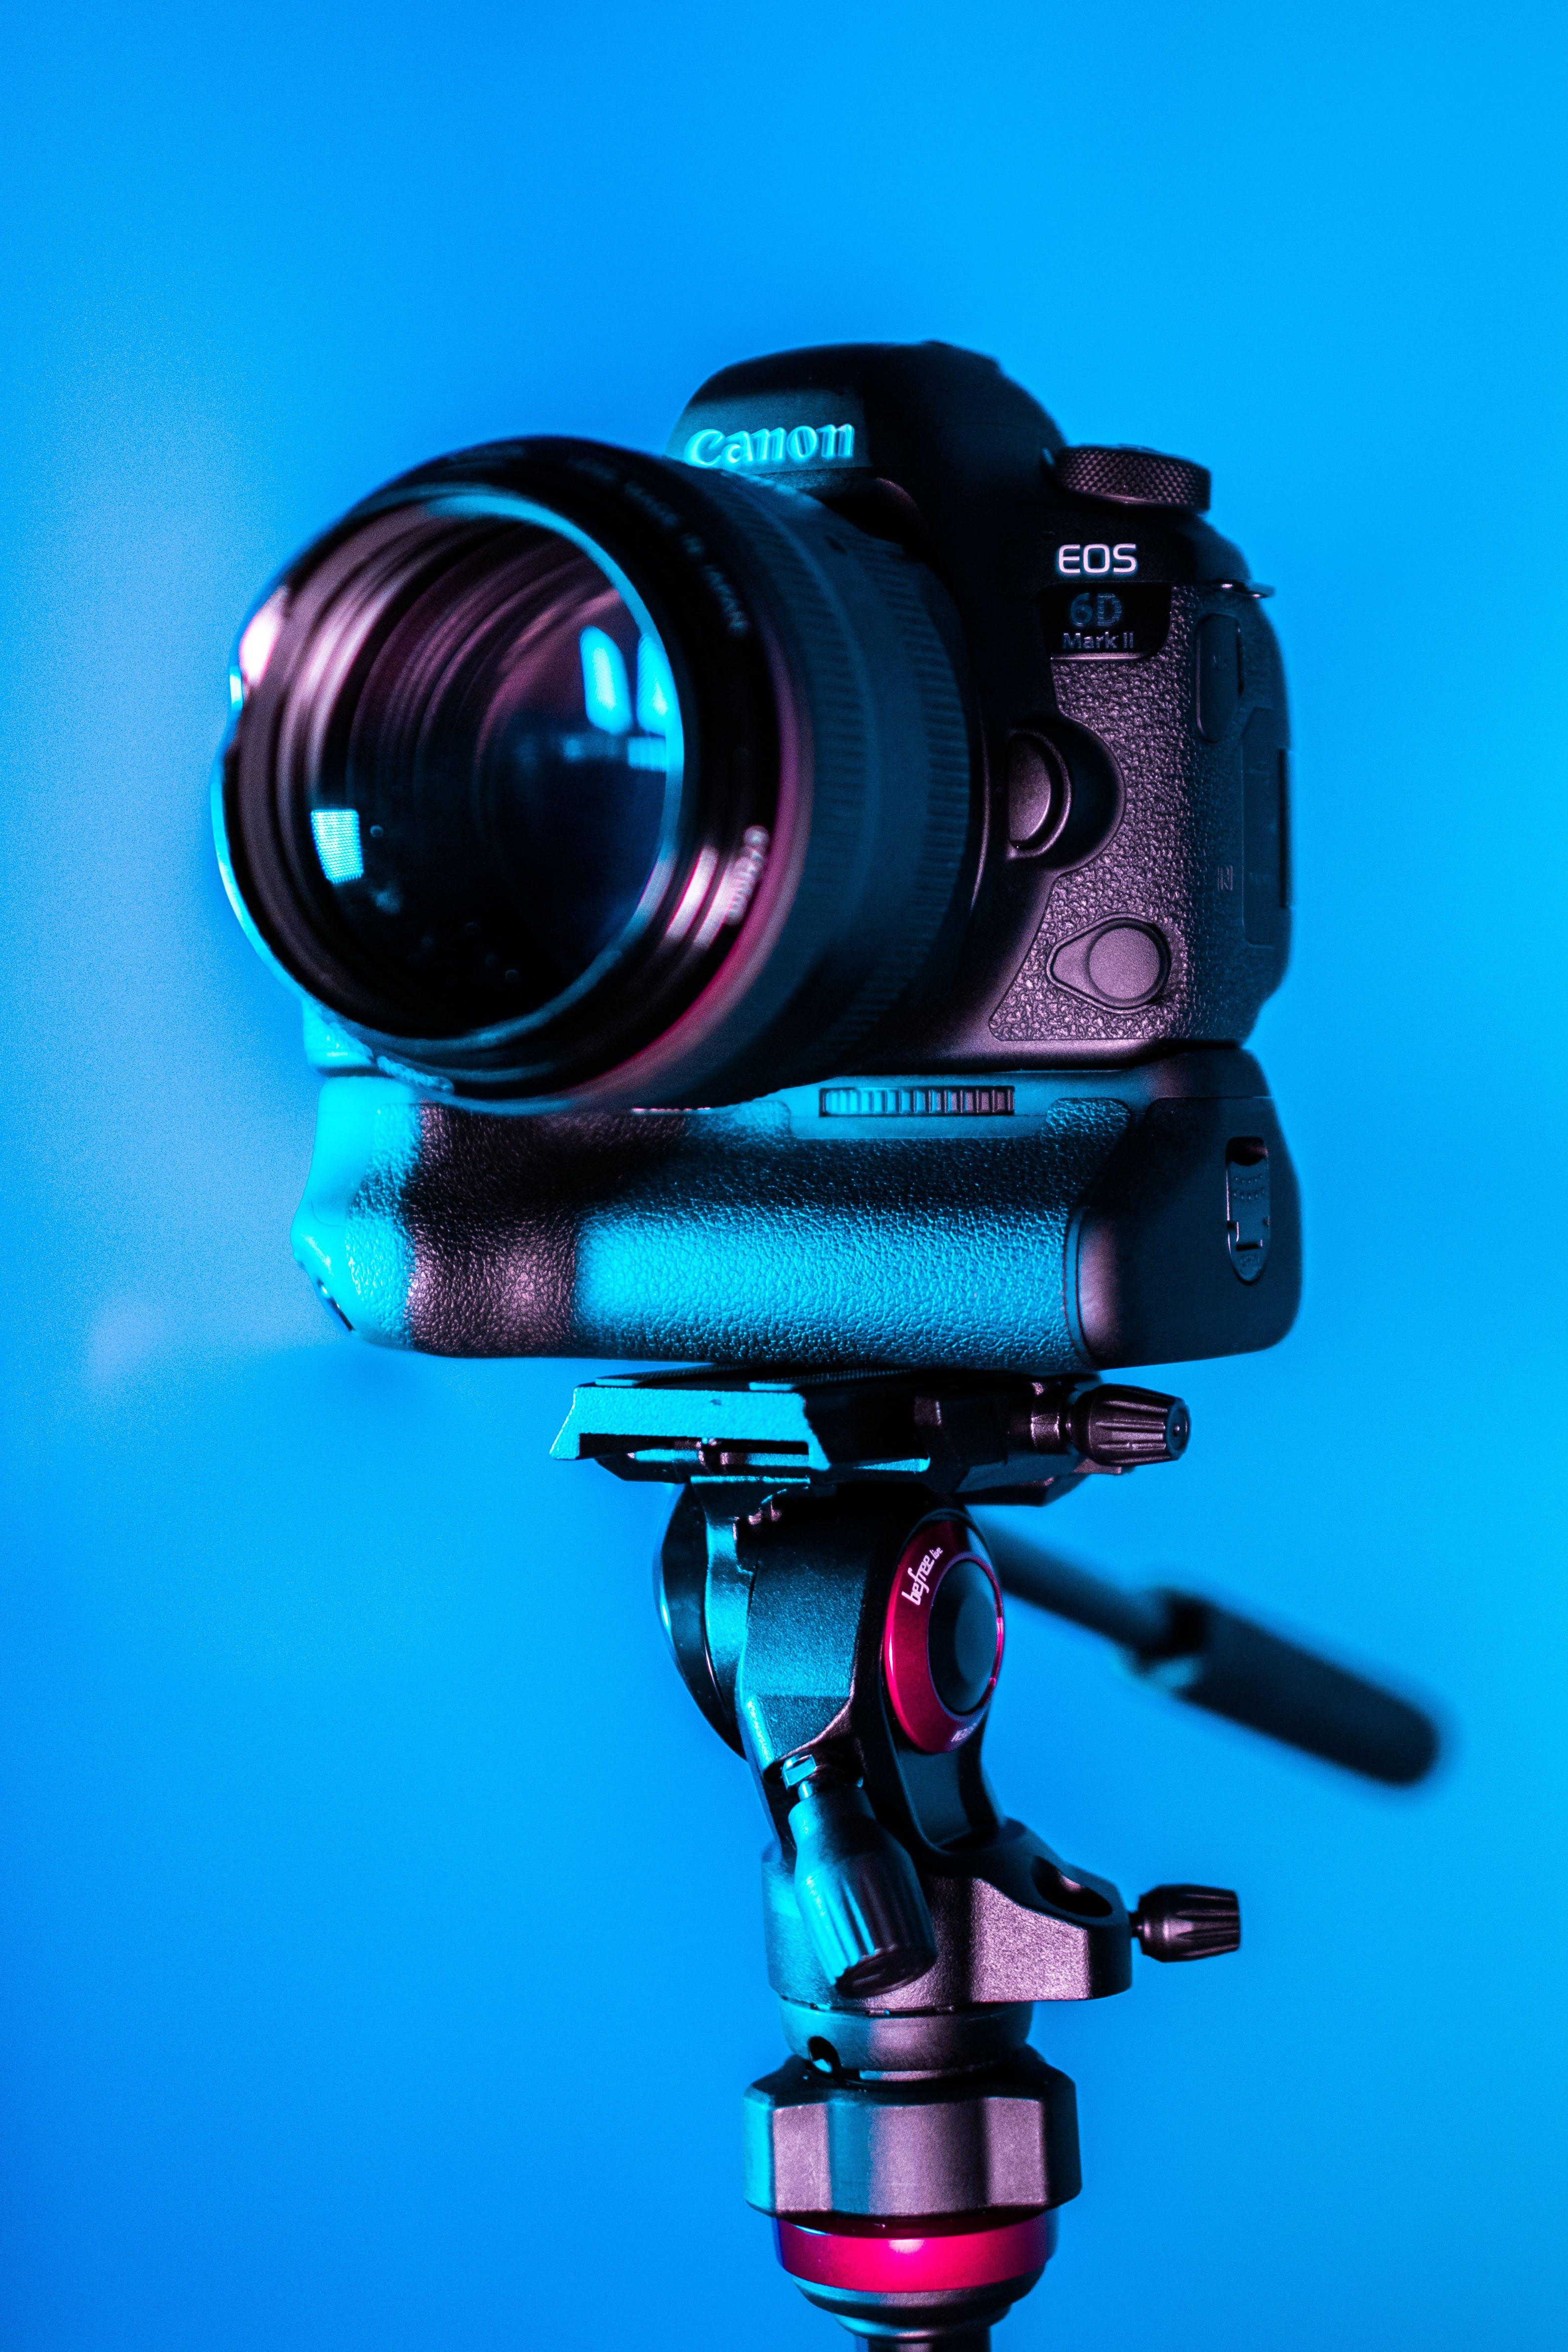 Close-Up Photo of Dslr Camera